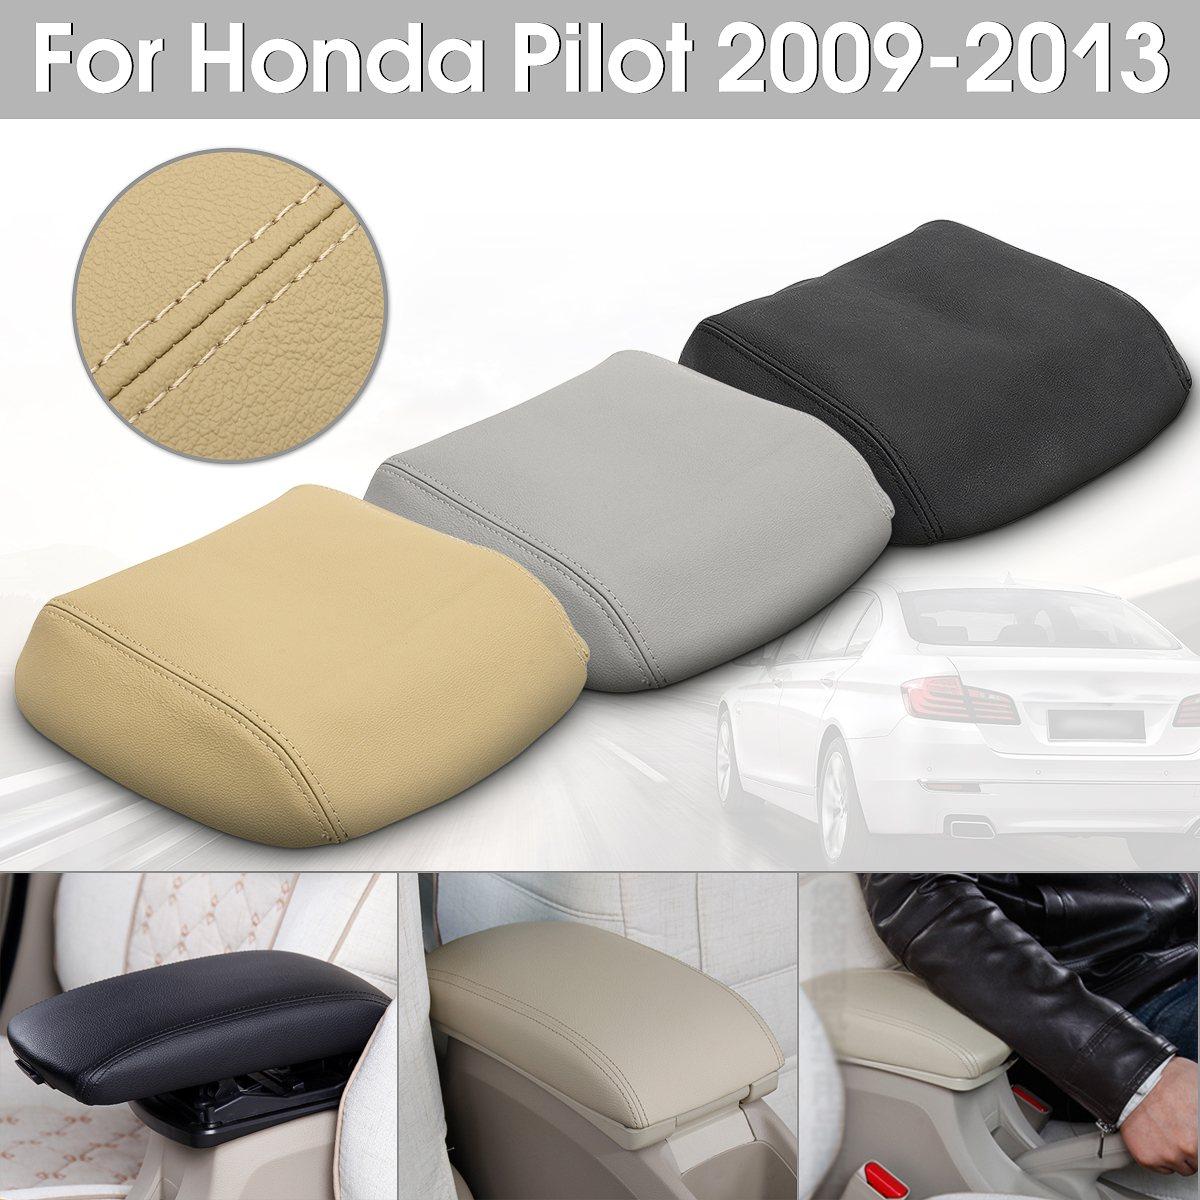 Car Braço Capa Center Console Lid Armrest Couro Real Tampa Pad Para Honda/Piloto 2009 2010 2011 2012 2013 preto/Cinza/Bege